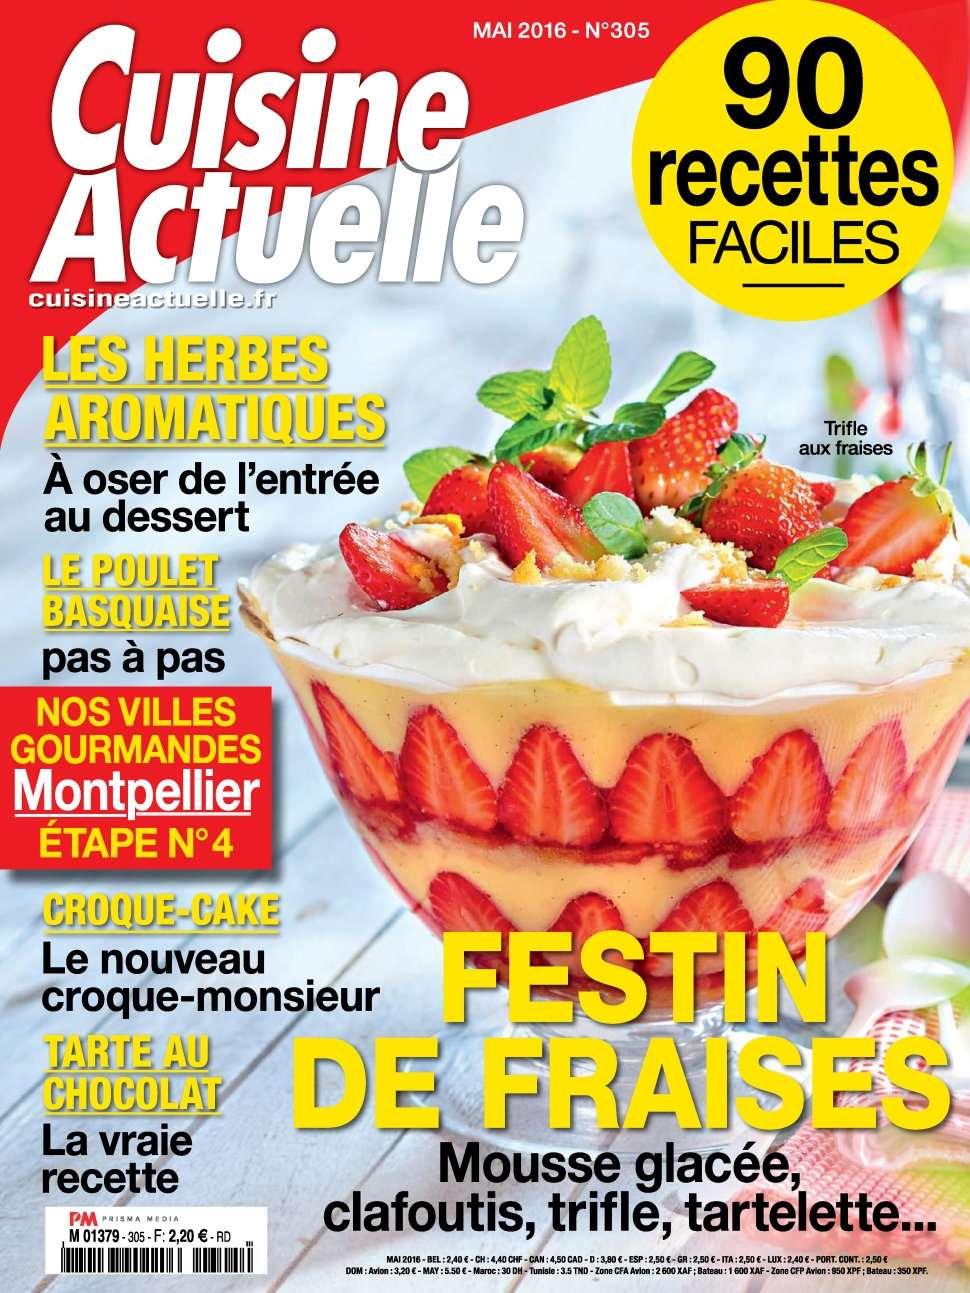 Cuisine Actuelle 305 - Mai 2016